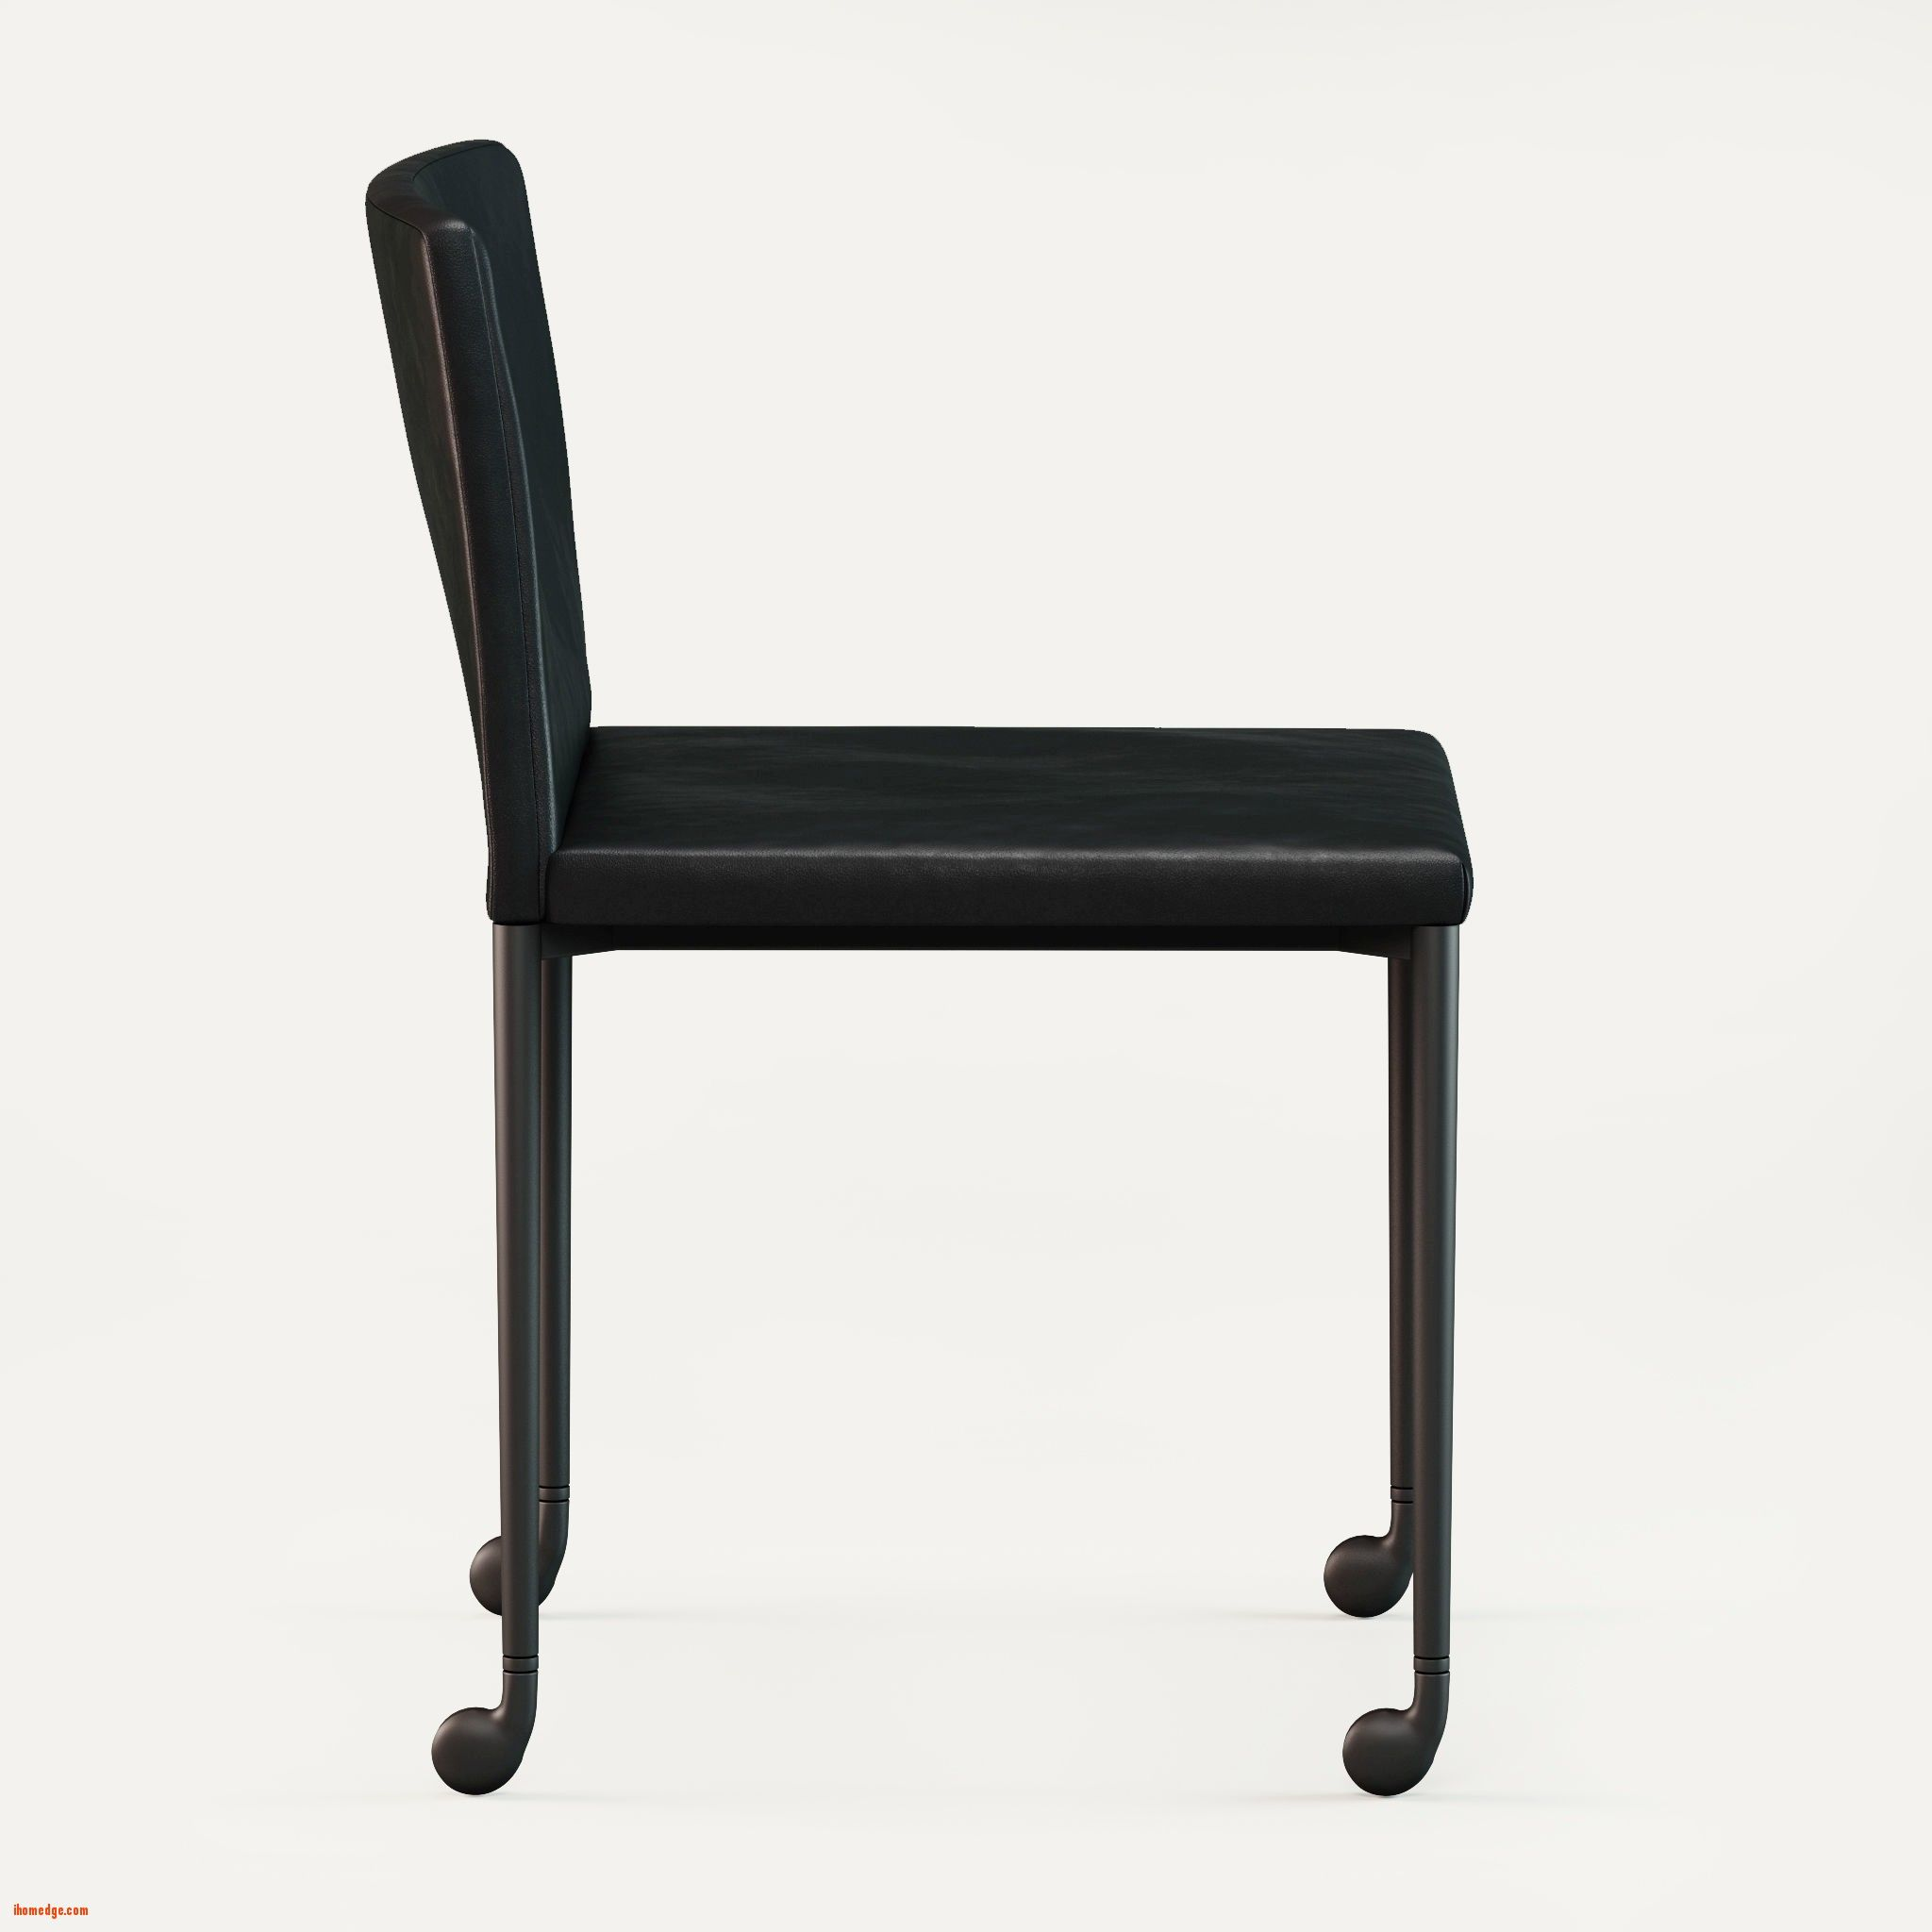 Best Luxury Roller Chair , Minotti Flynt Roller Armchair 3d Model Max Fbx 3  , Http